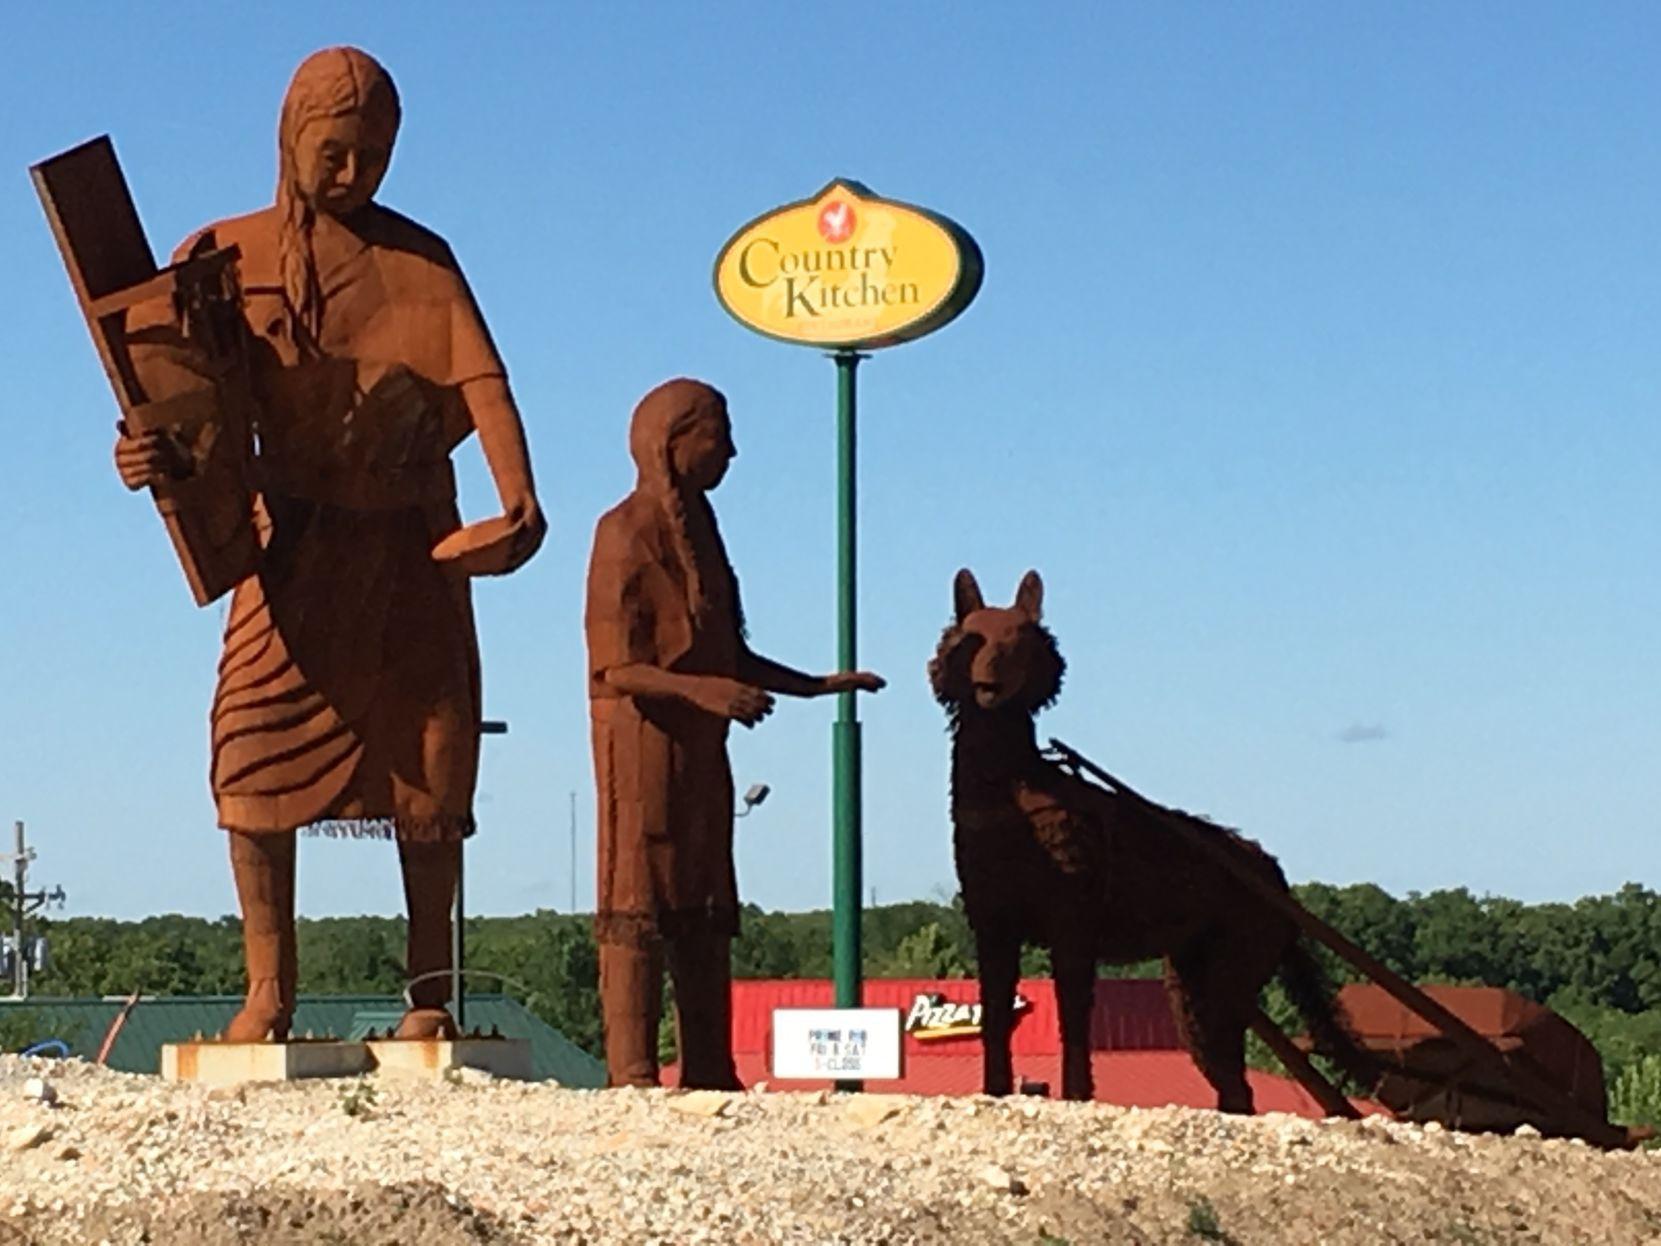 St Charles Missouri  CityDatacom